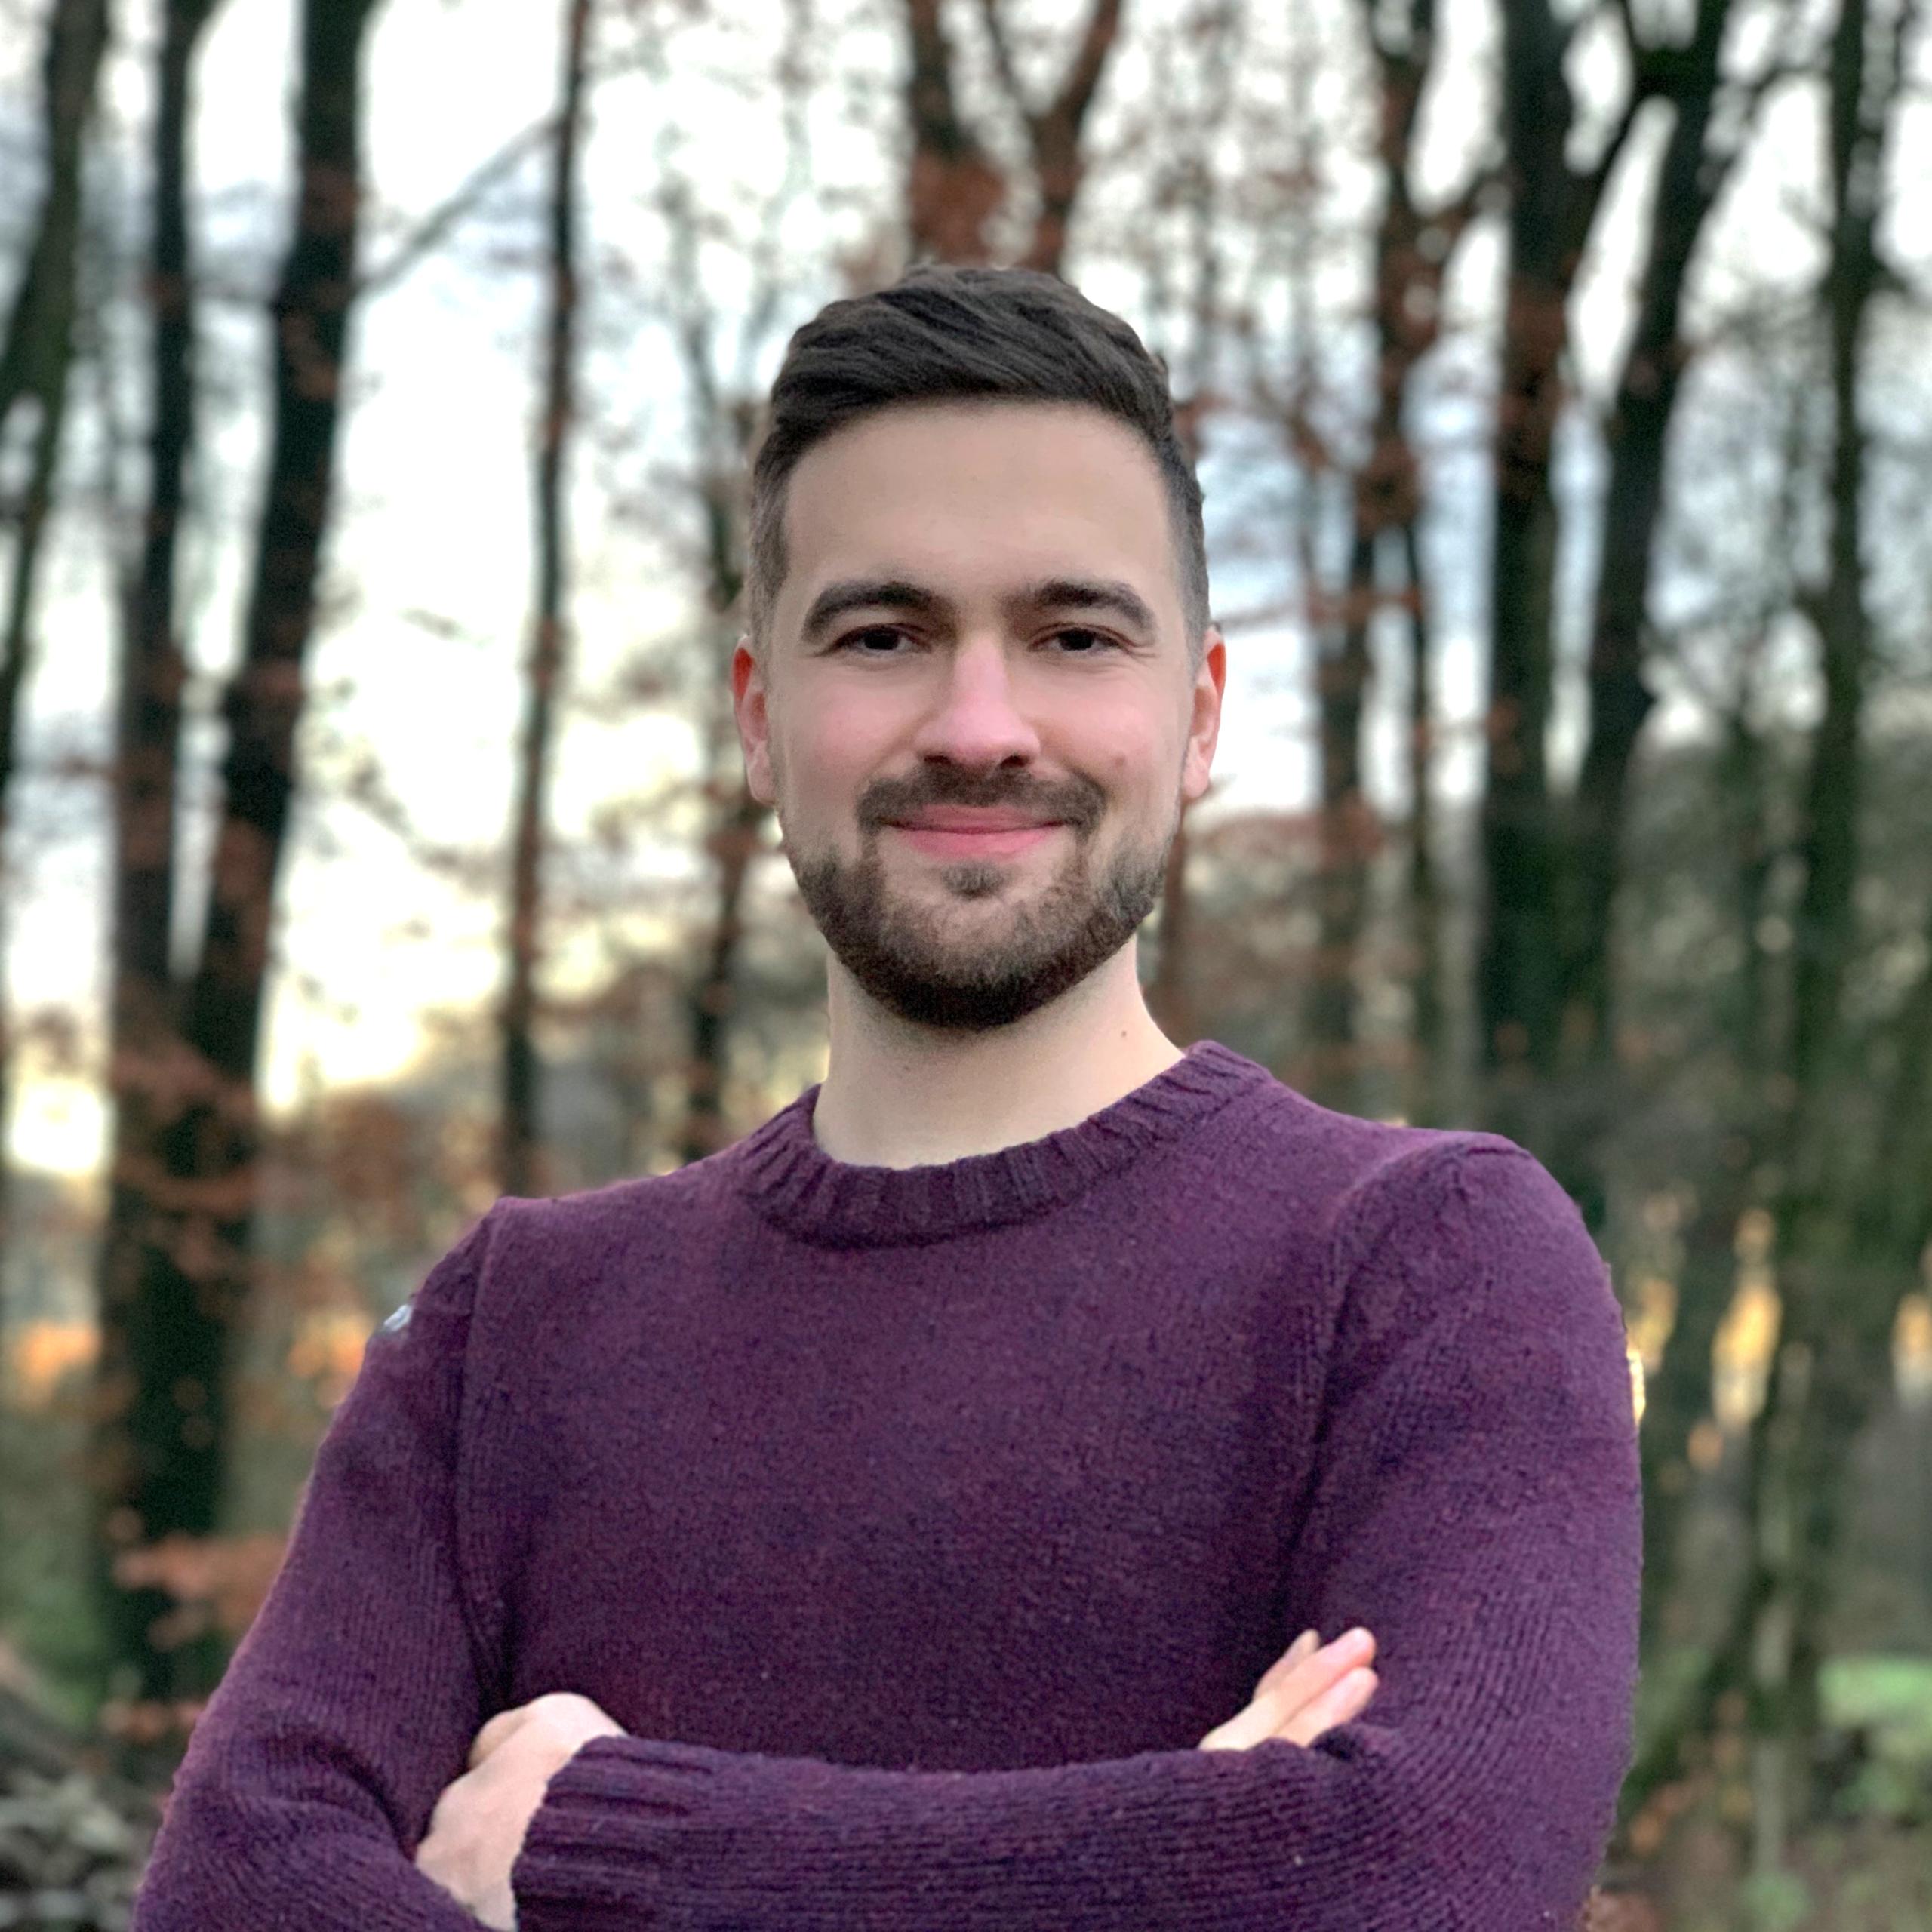 Mitglied Simon Fels Profilfoto